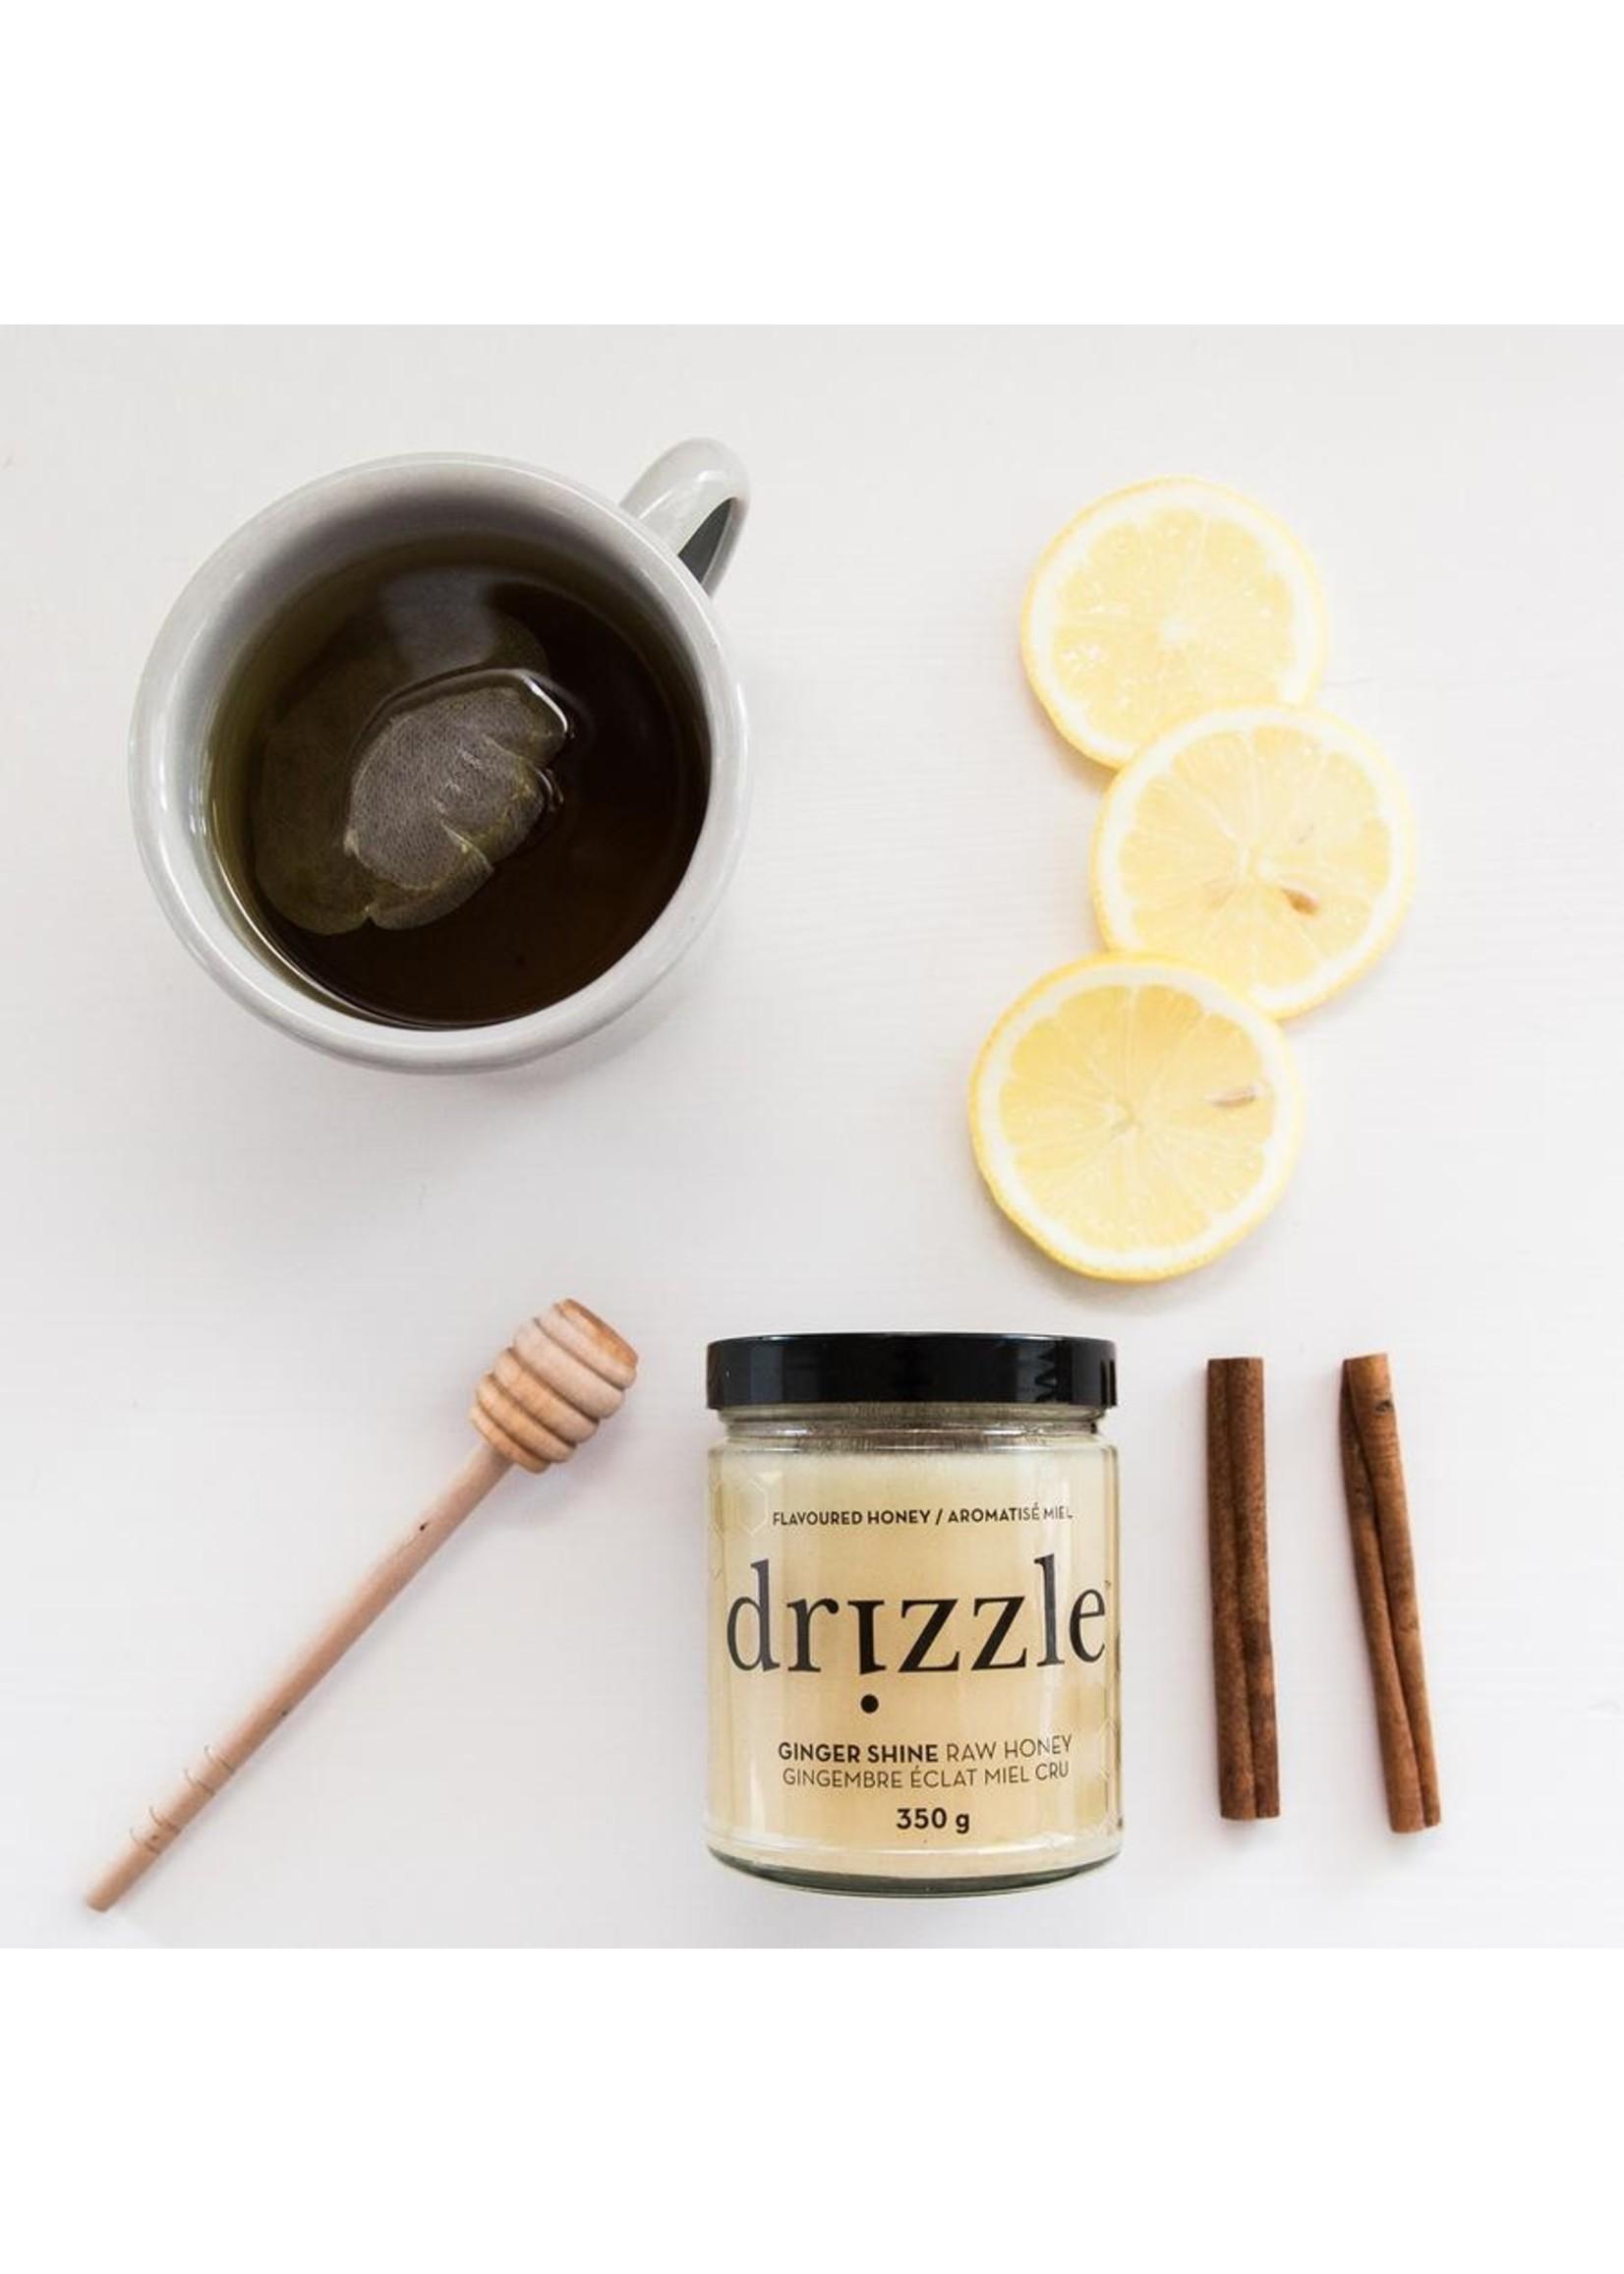 Drizzle Honey Ginger Shine Superfood Honey